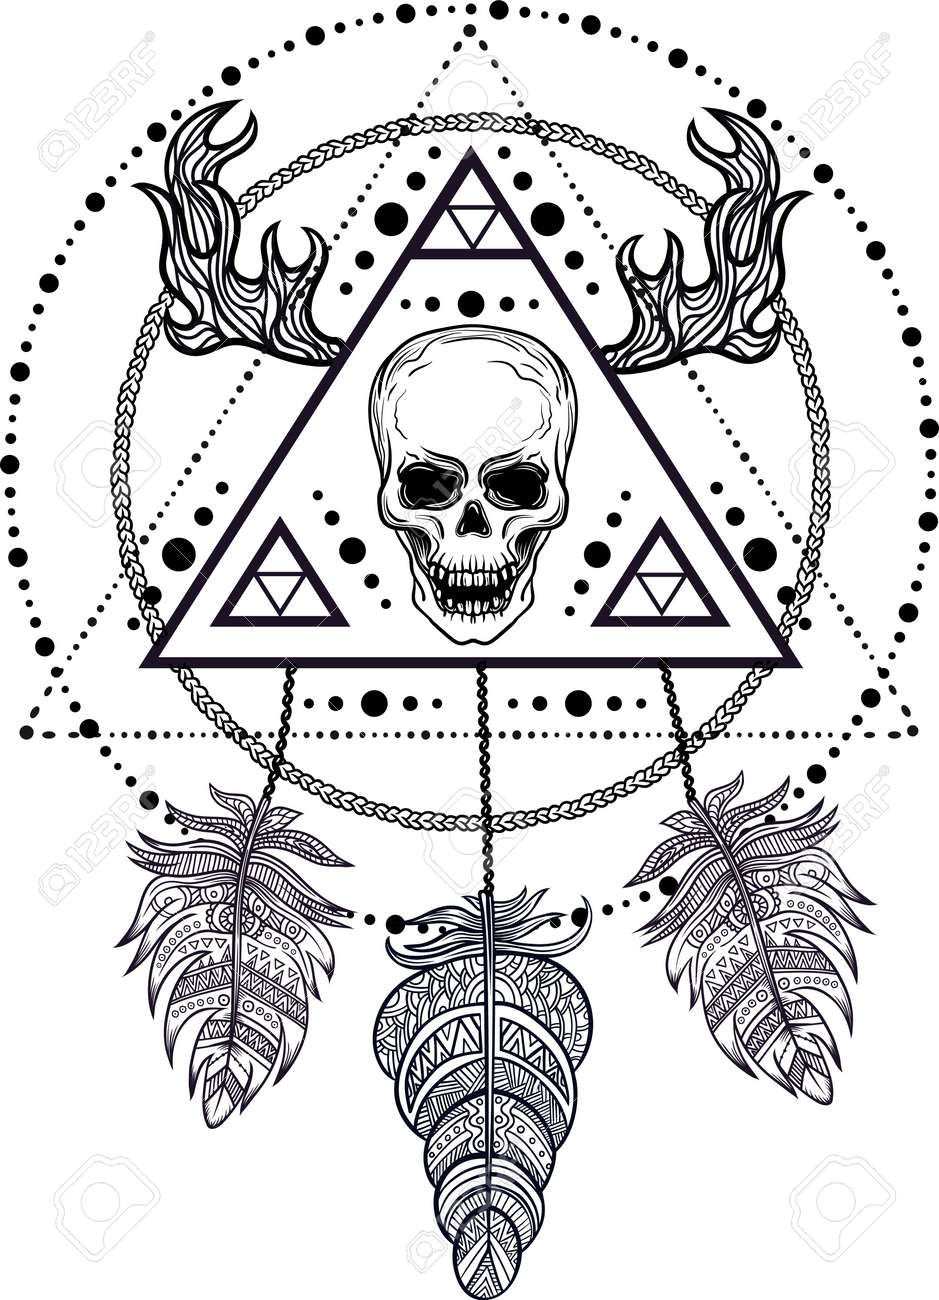 Mystic Tattoo Designs : mystic, tattoo, designs, Blackwork, Tattoo, Flash., Dreamcatcher, Human, Skull,, Feathers.., Royalty, Cliparts,, Vectors,, Stock, Illustration., Image, 64863187.